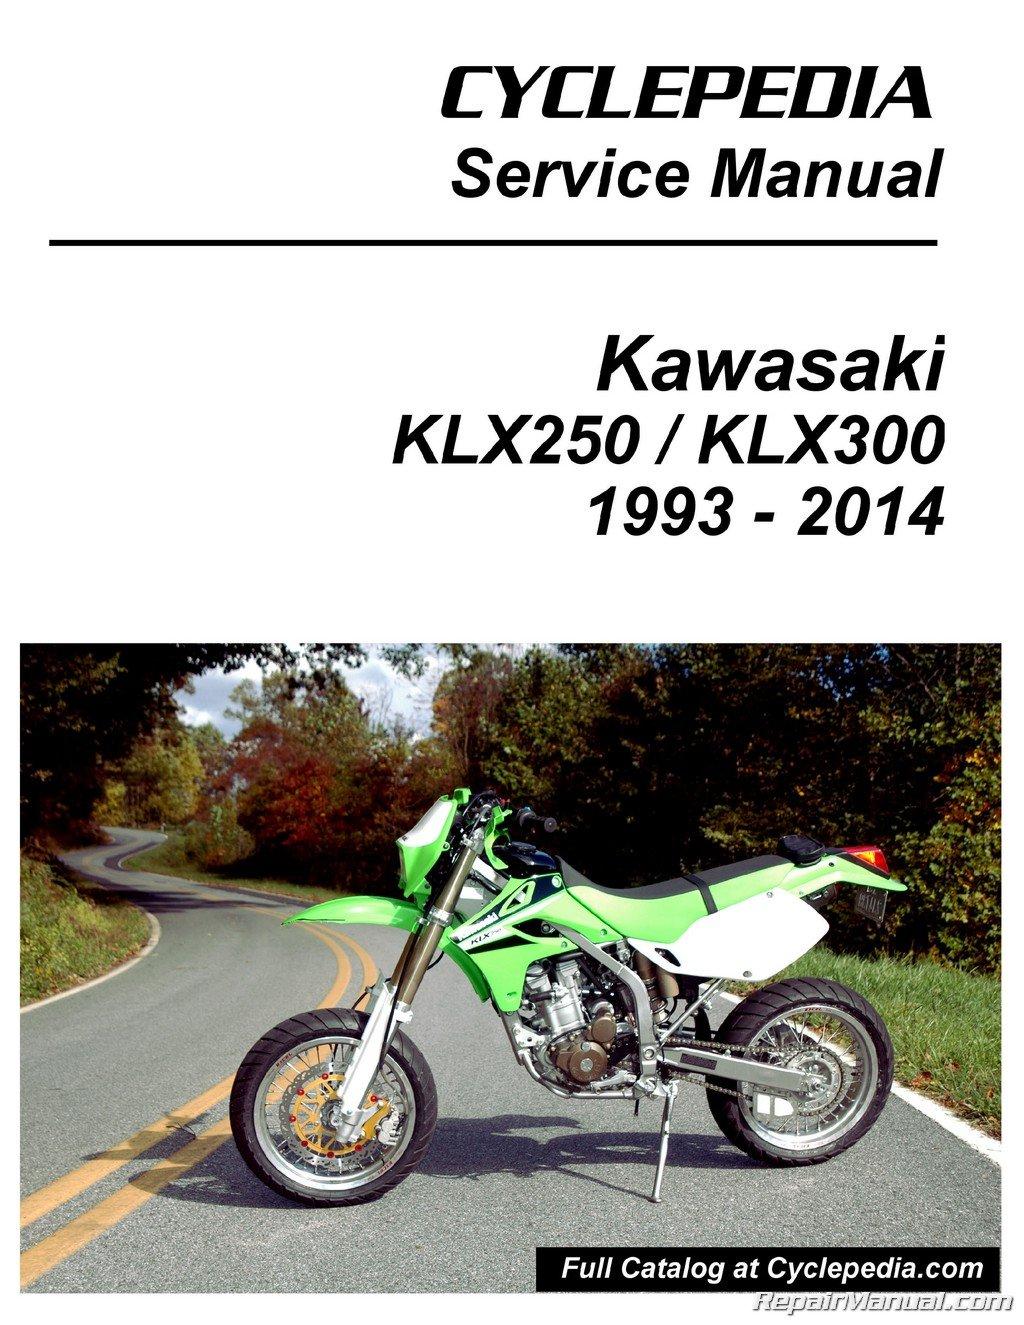 CPP-111-P Kawasaki KLX250 KLX300 Printed Cyclepedia Motorcycle Service  Manual: Manufacturer: Amazon.com: Books